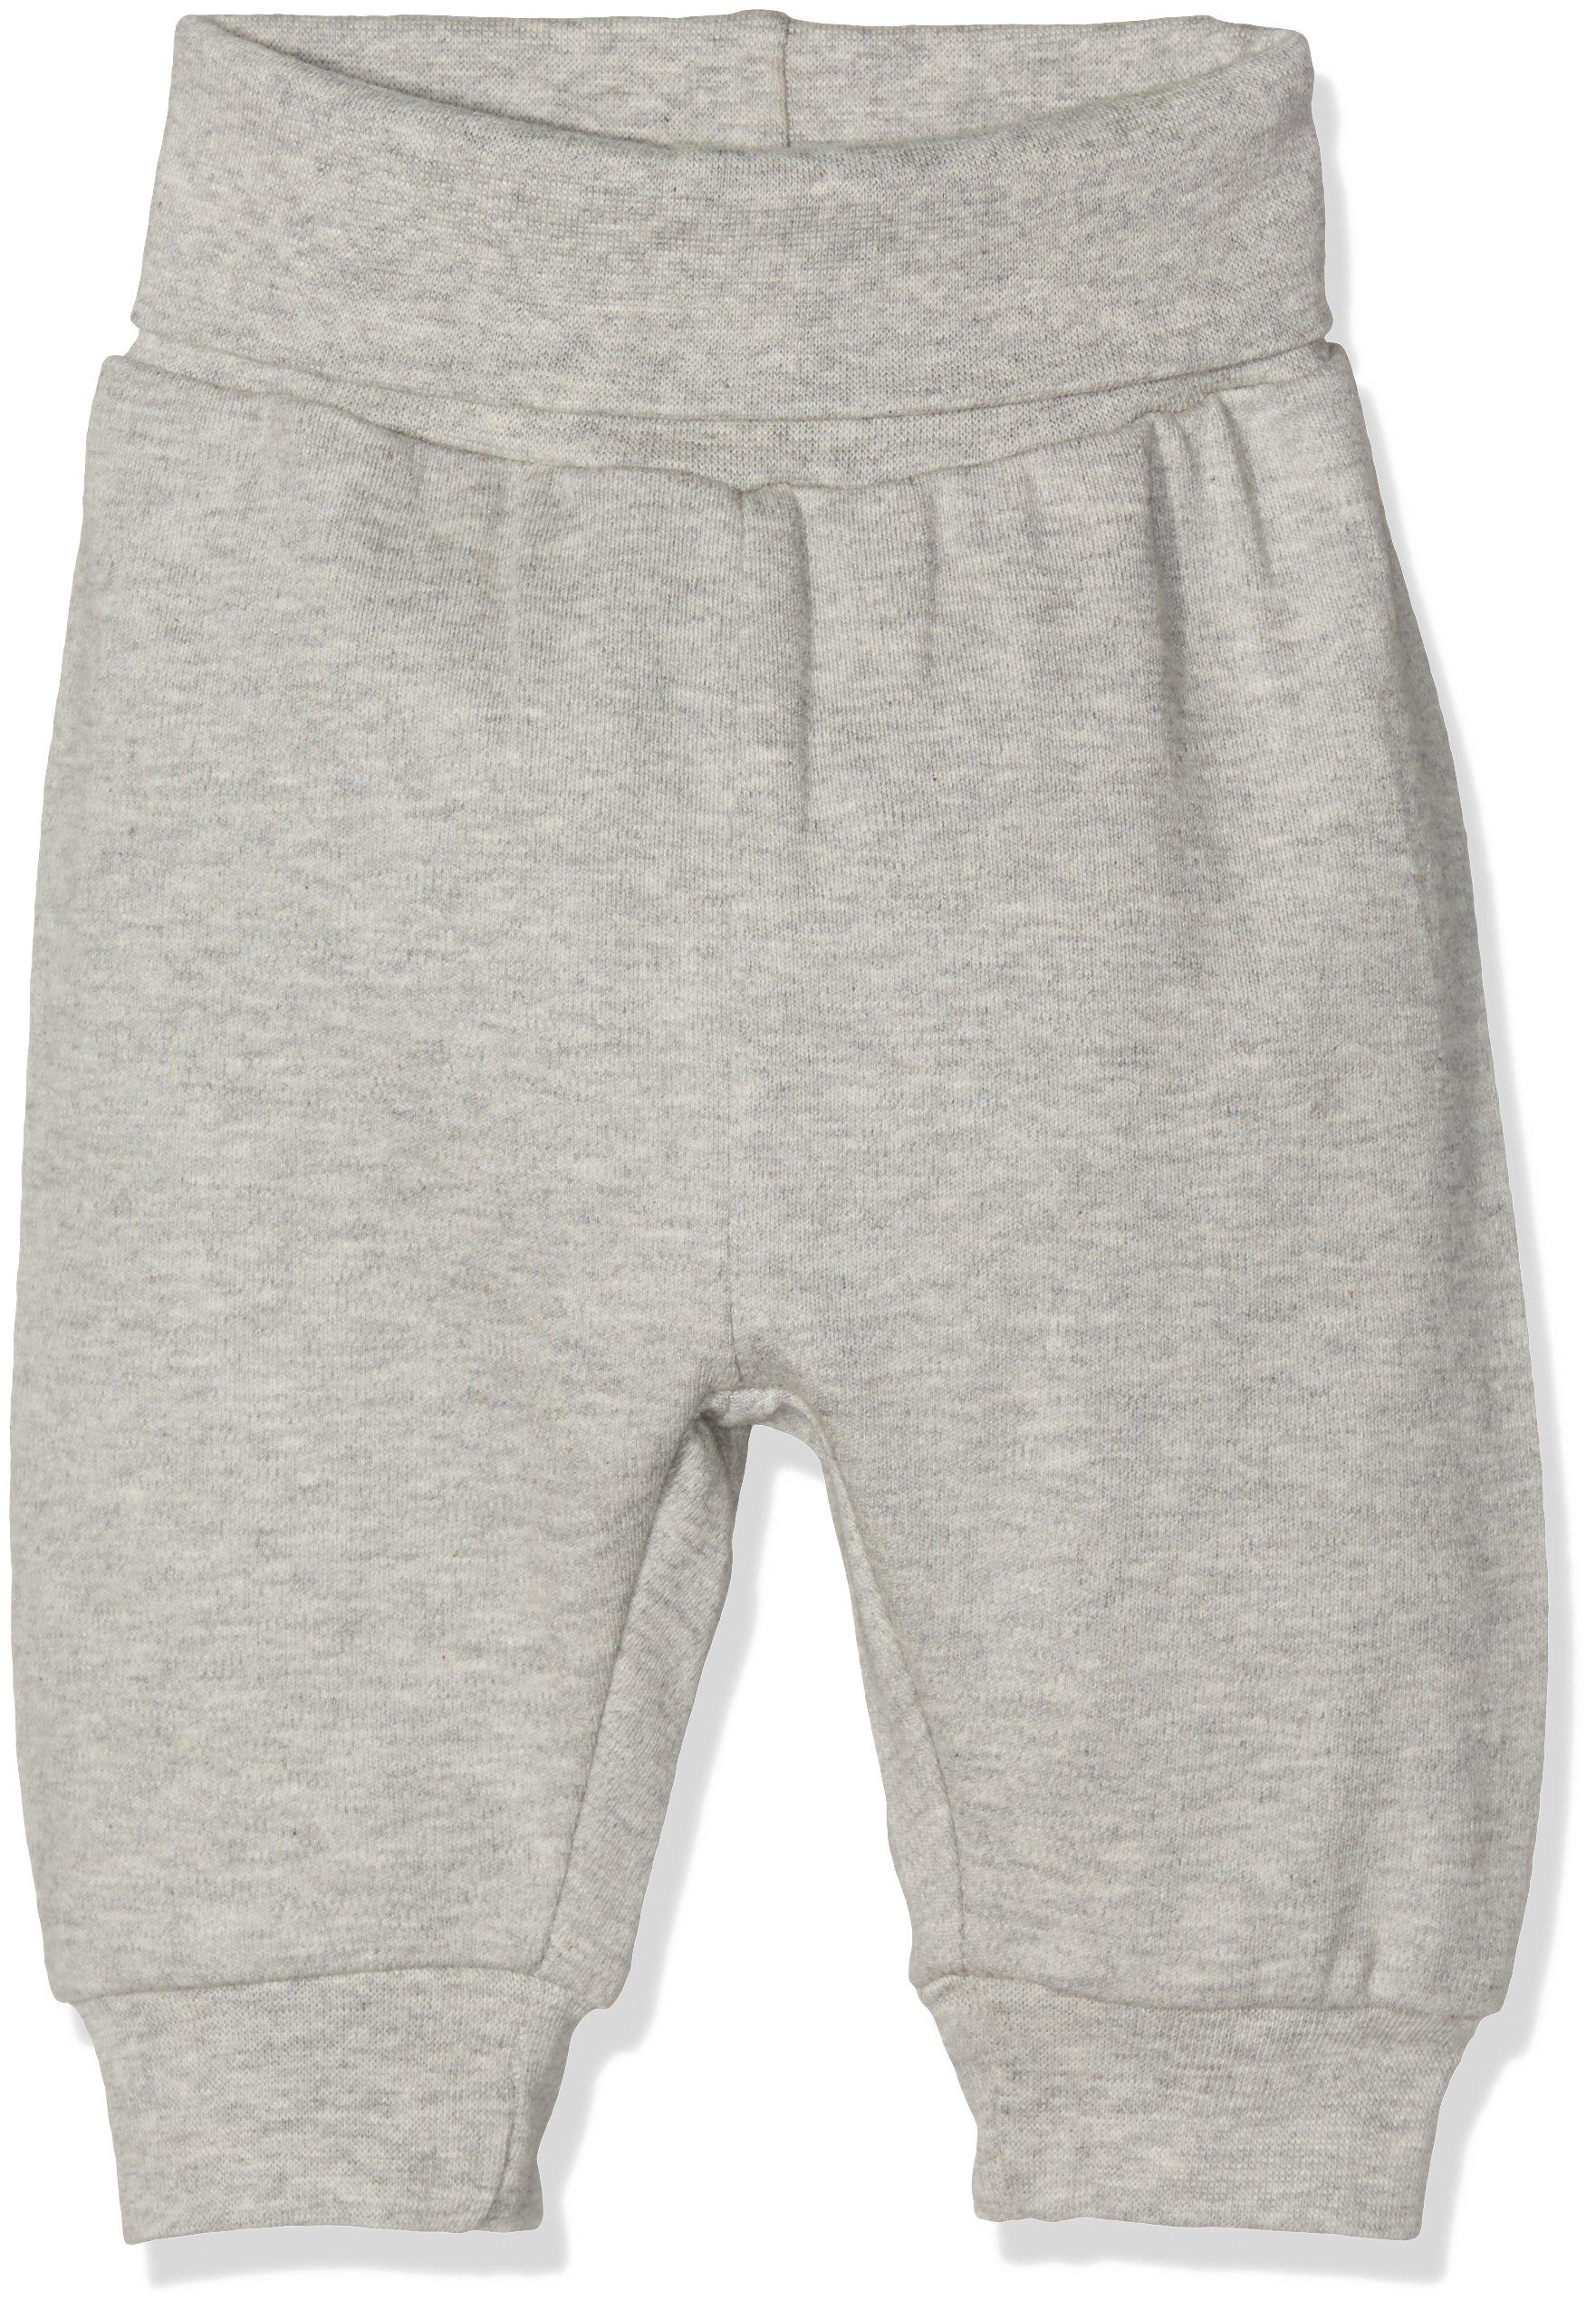 Schnizler Baby-Pumphose Interlock Pantalones para Bebés 1